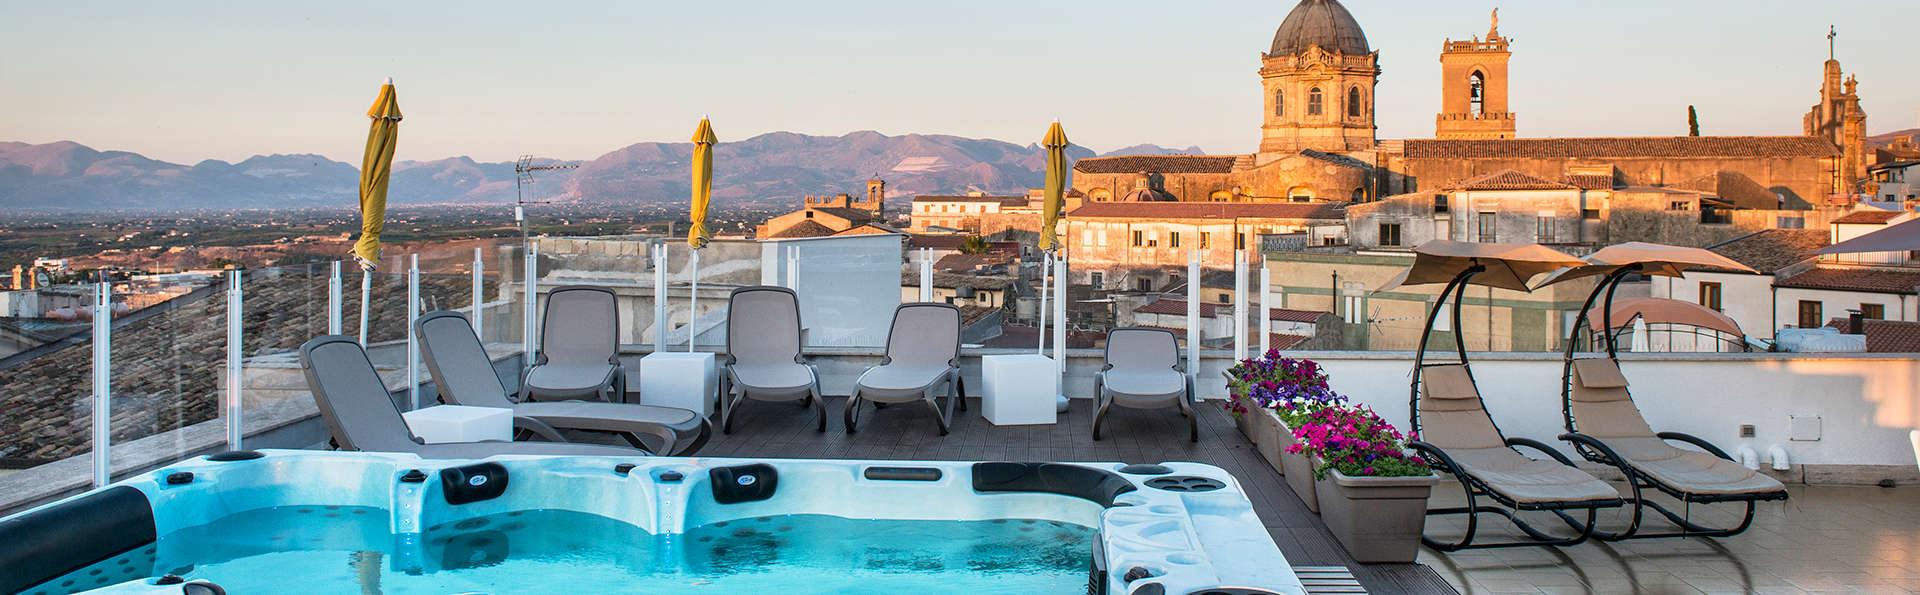 Hotel Centrale - Alcamo - EDIT_NEW_Terrace-Jacuzzi.jpg